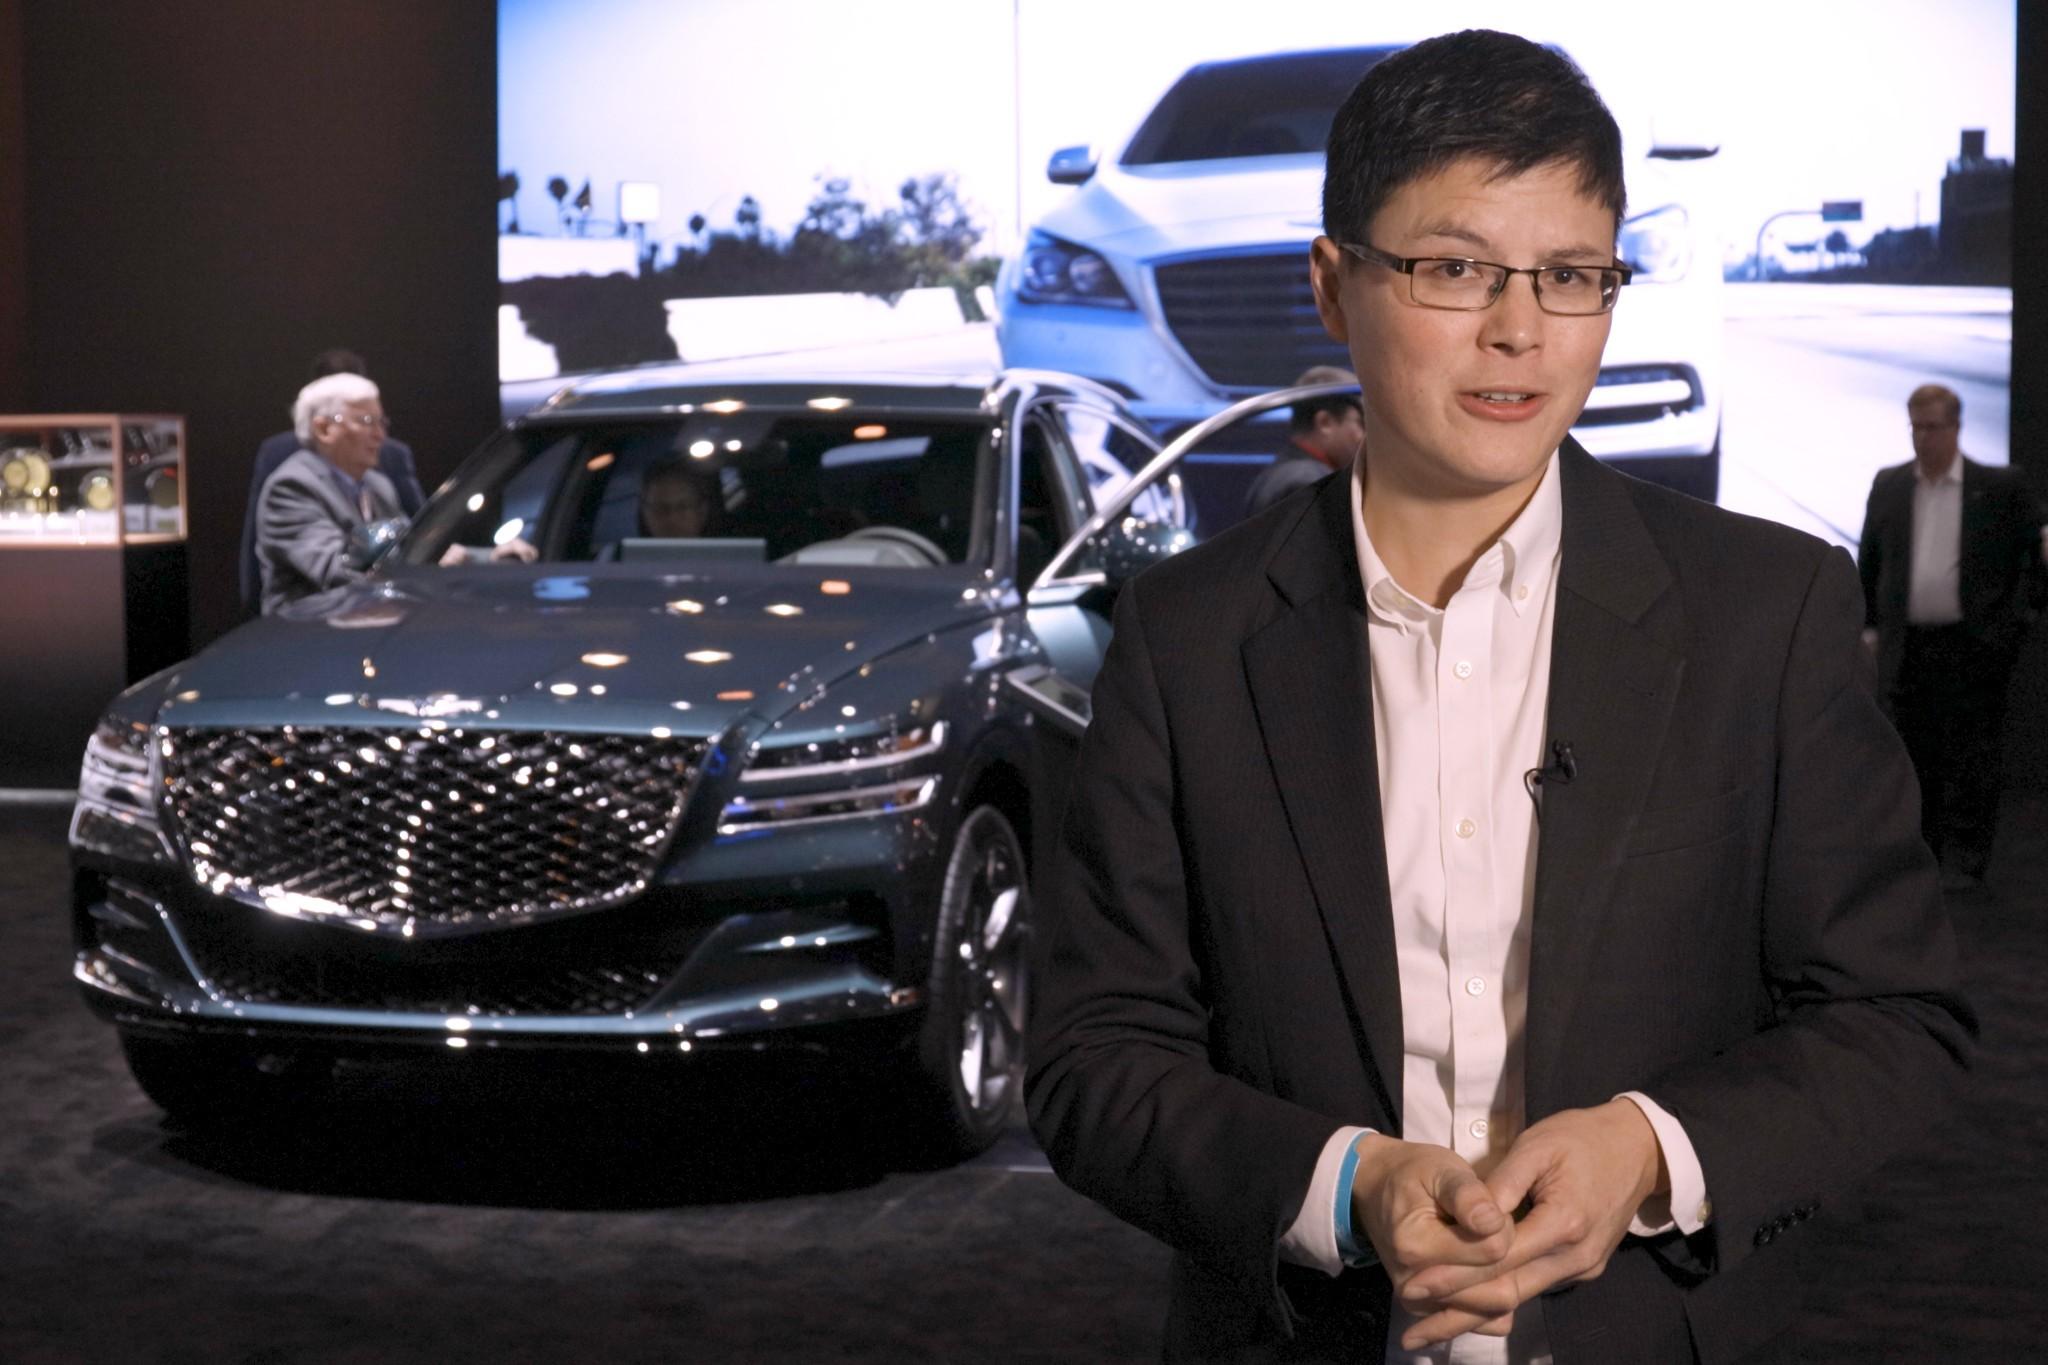 2021 Genesis GV80 Video: Not Just Some Spiffed-Up Hyundai Palisade